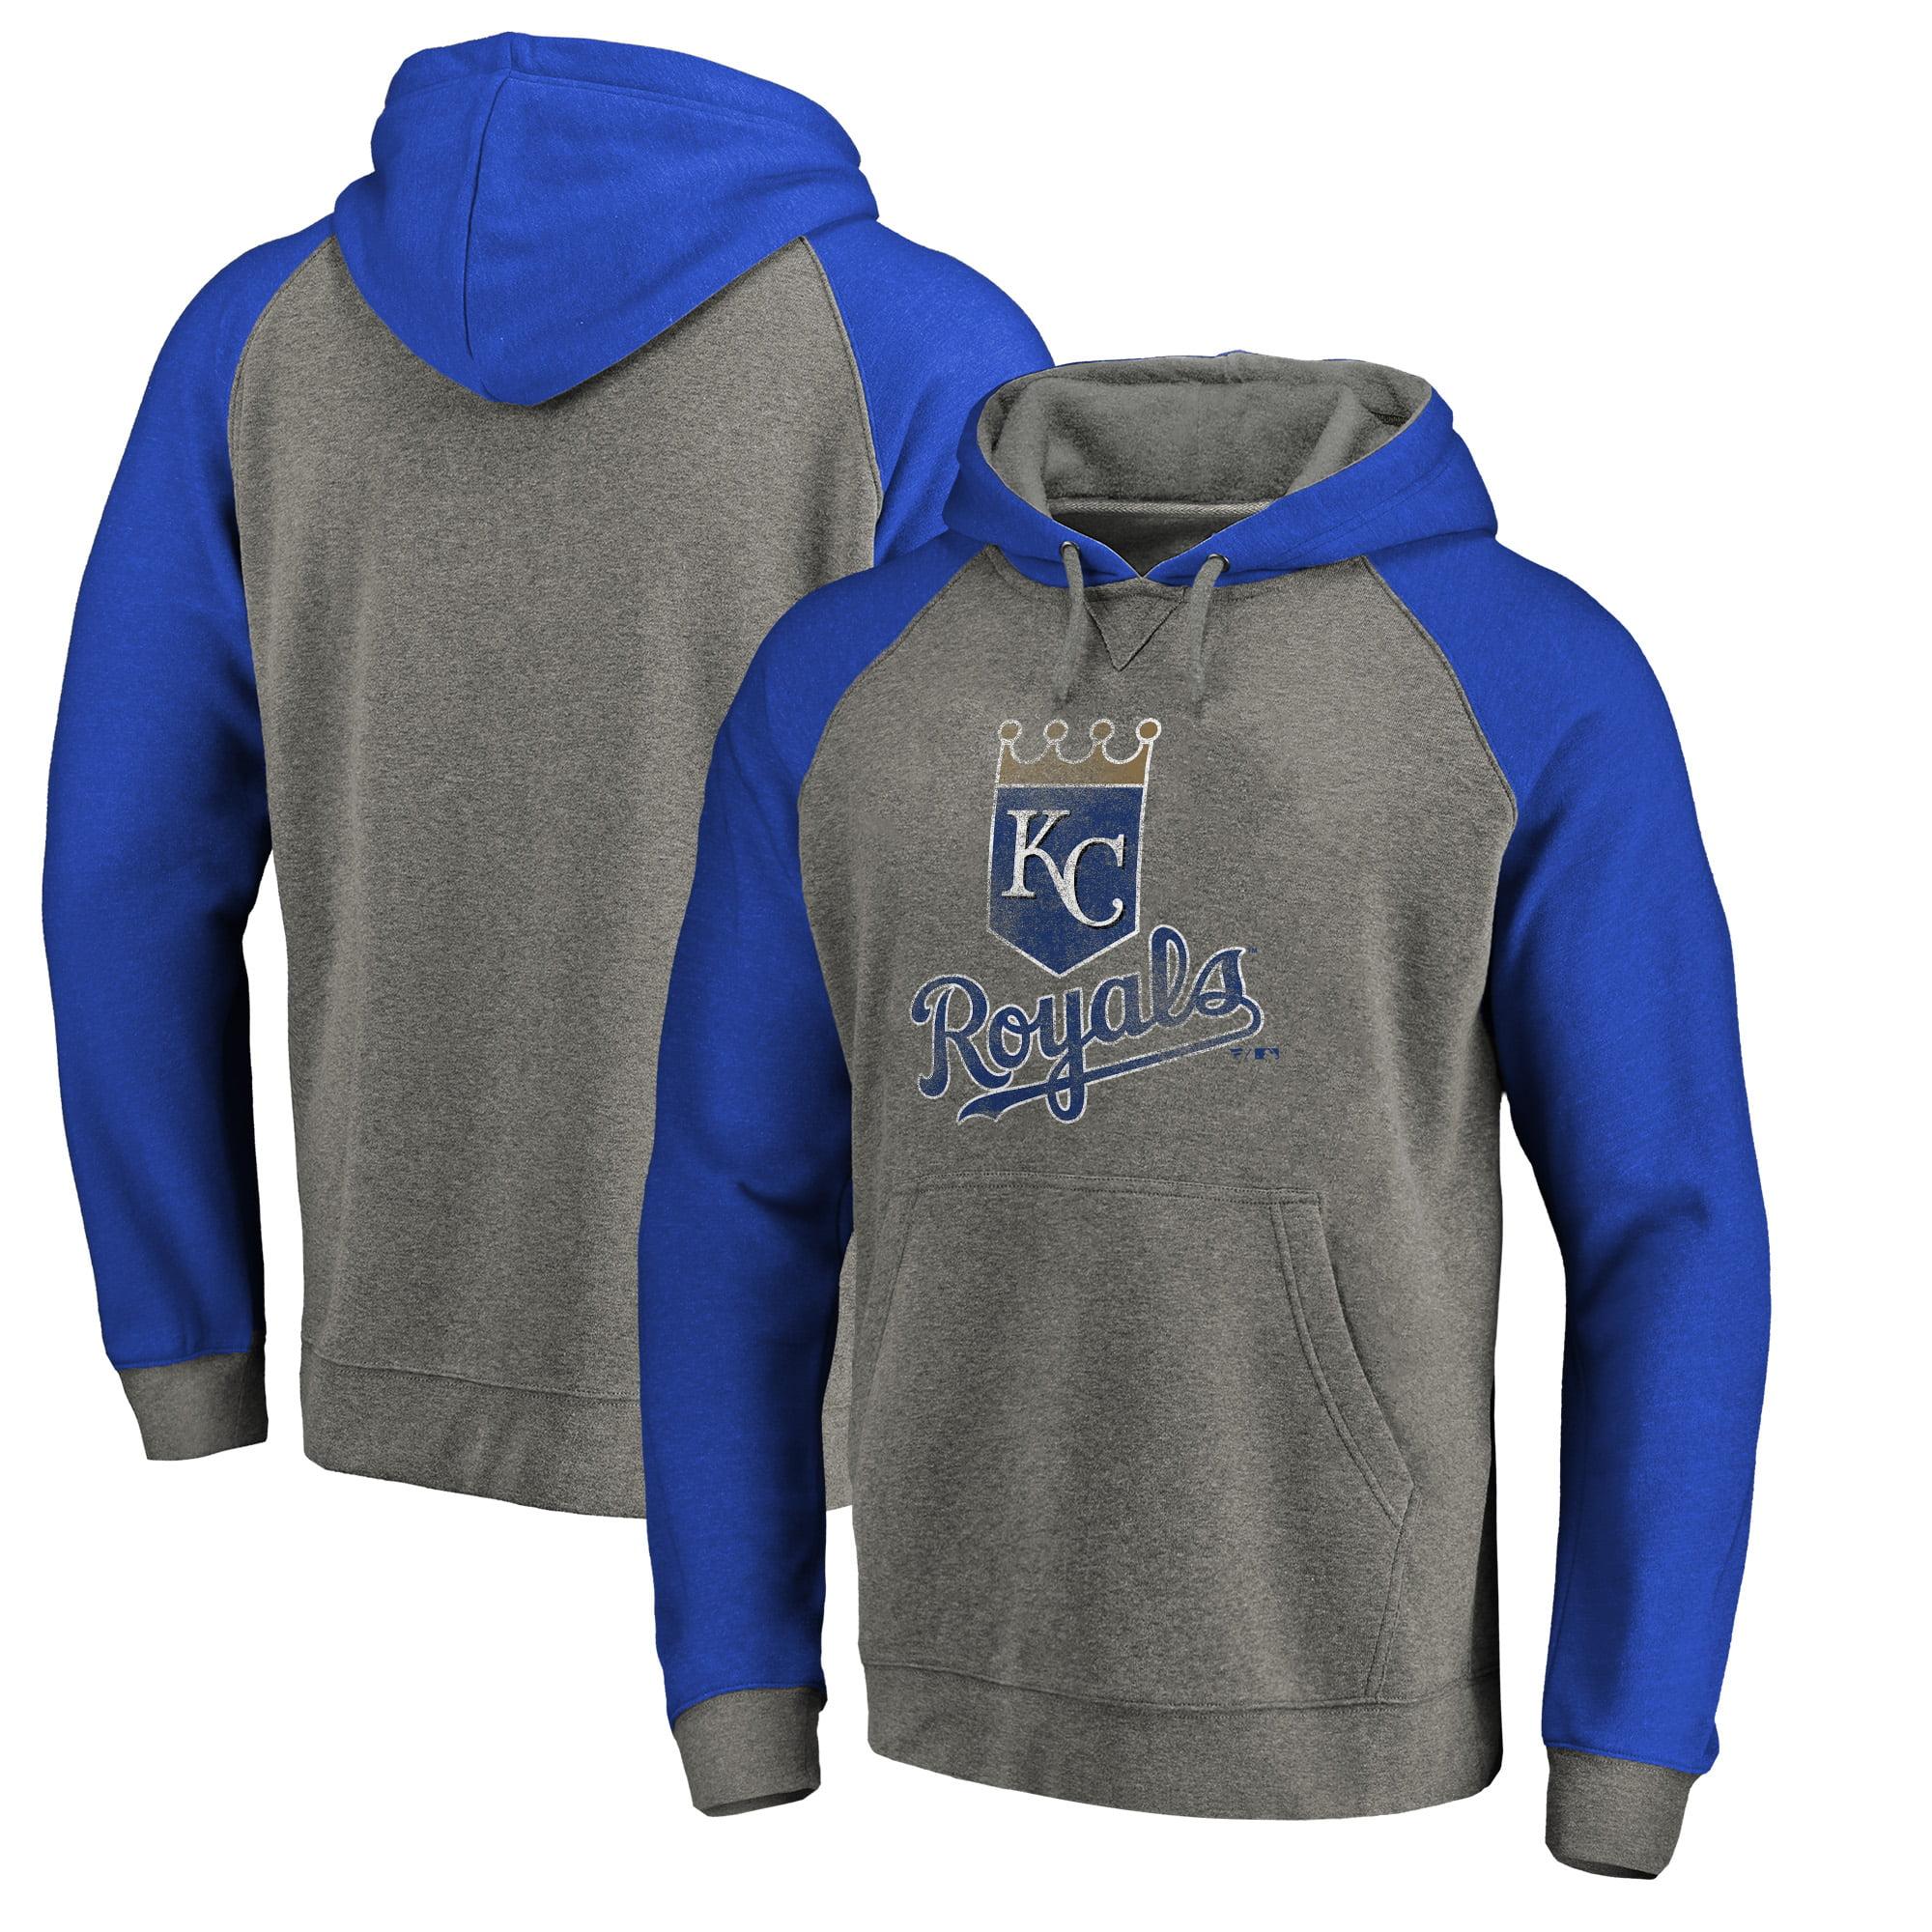 Kansas City Royals Fanatics Branded Distressed Team Logo Tri-Blend Raglan Pullover Hoodie - Gray/Royal